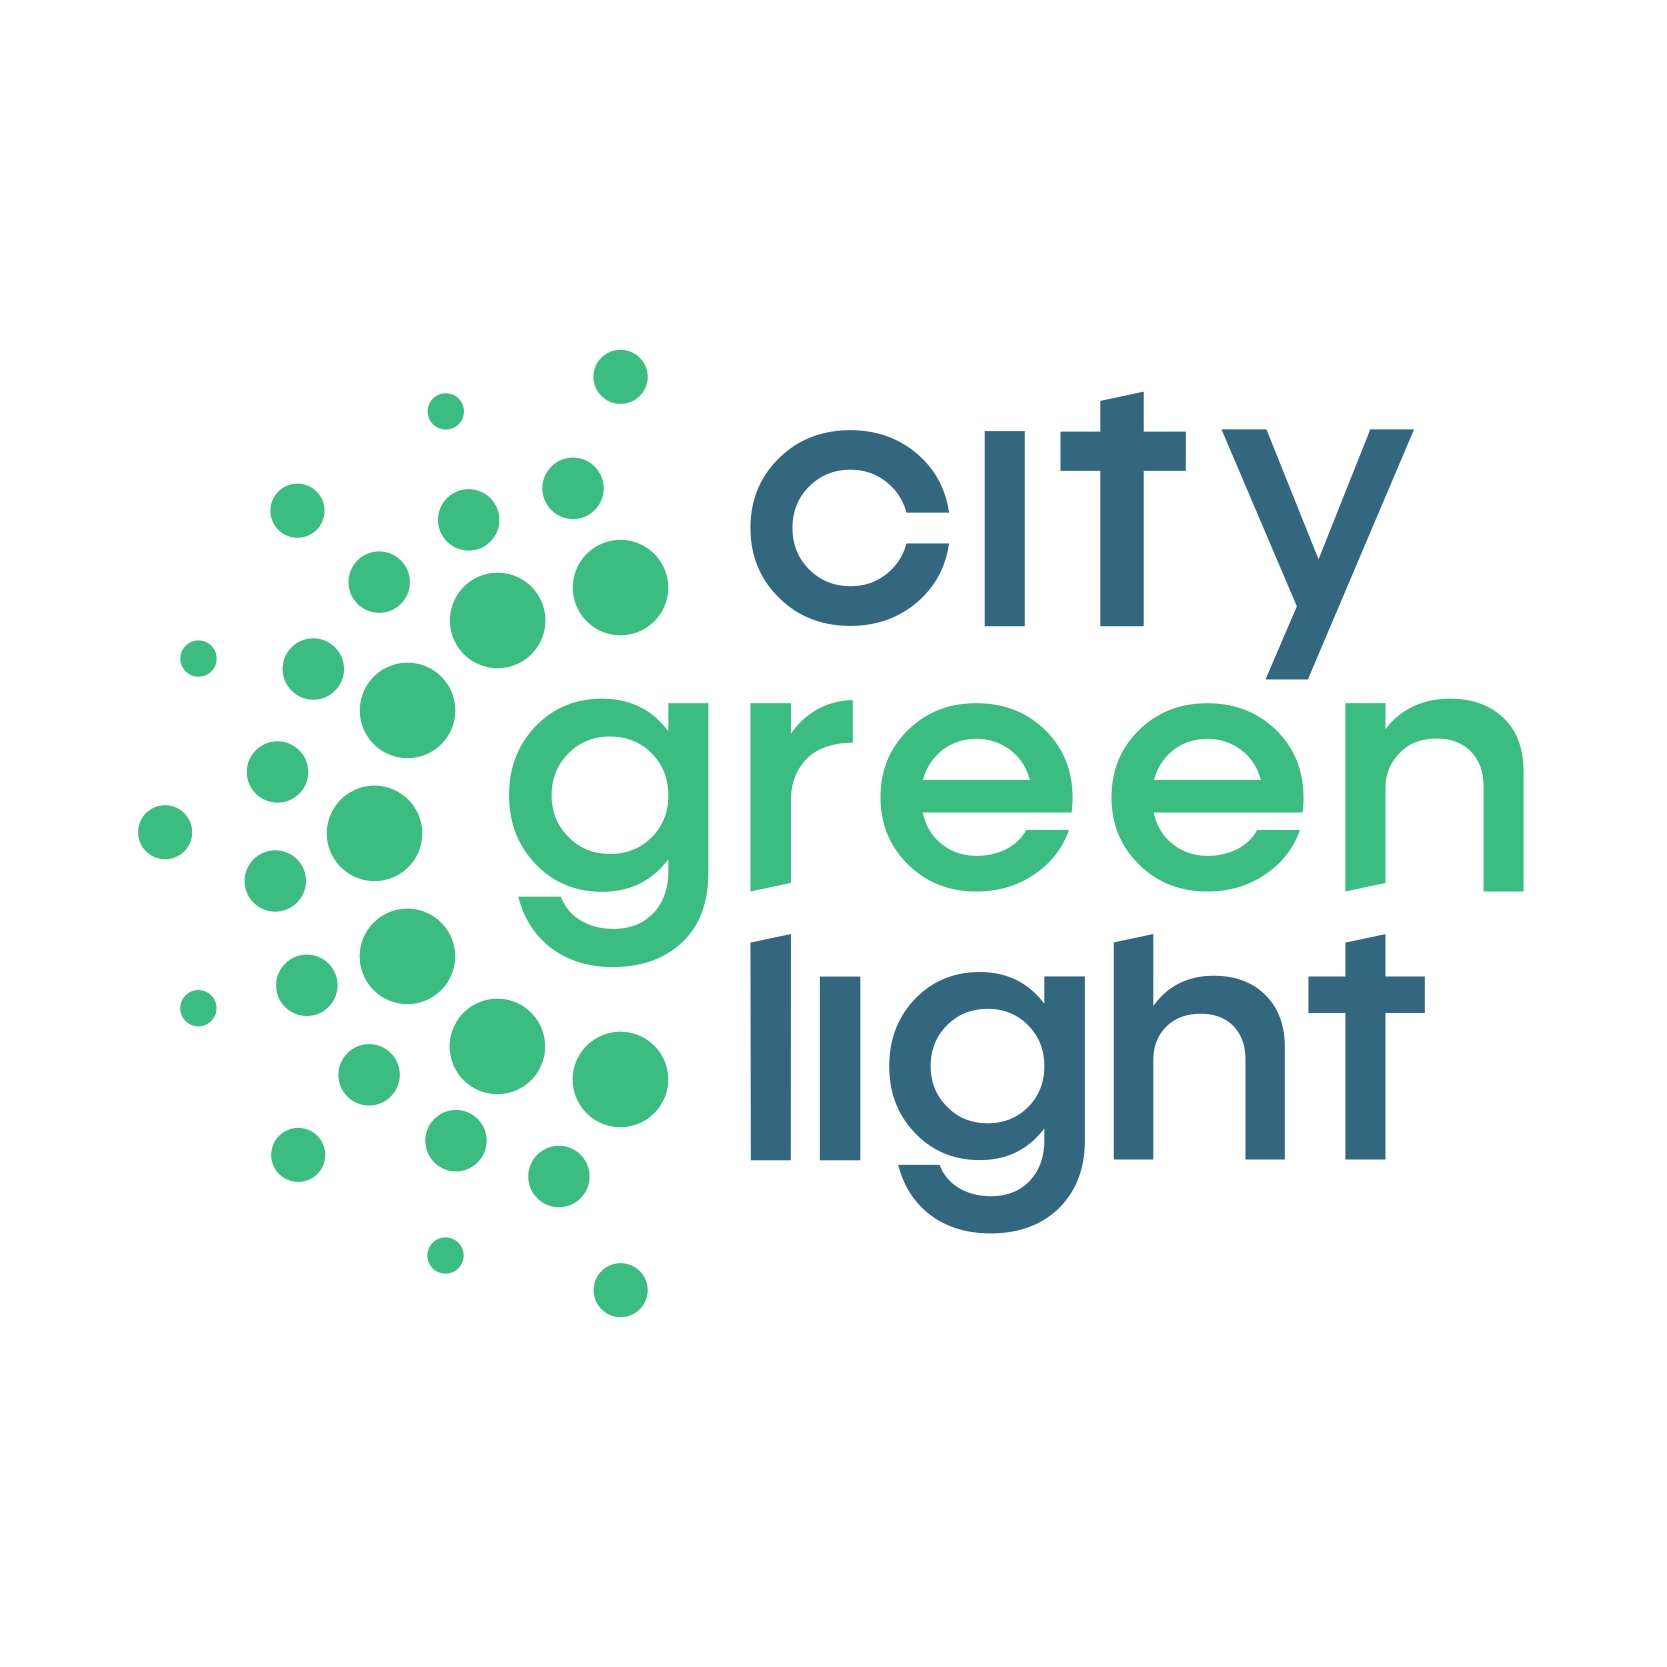 city green light